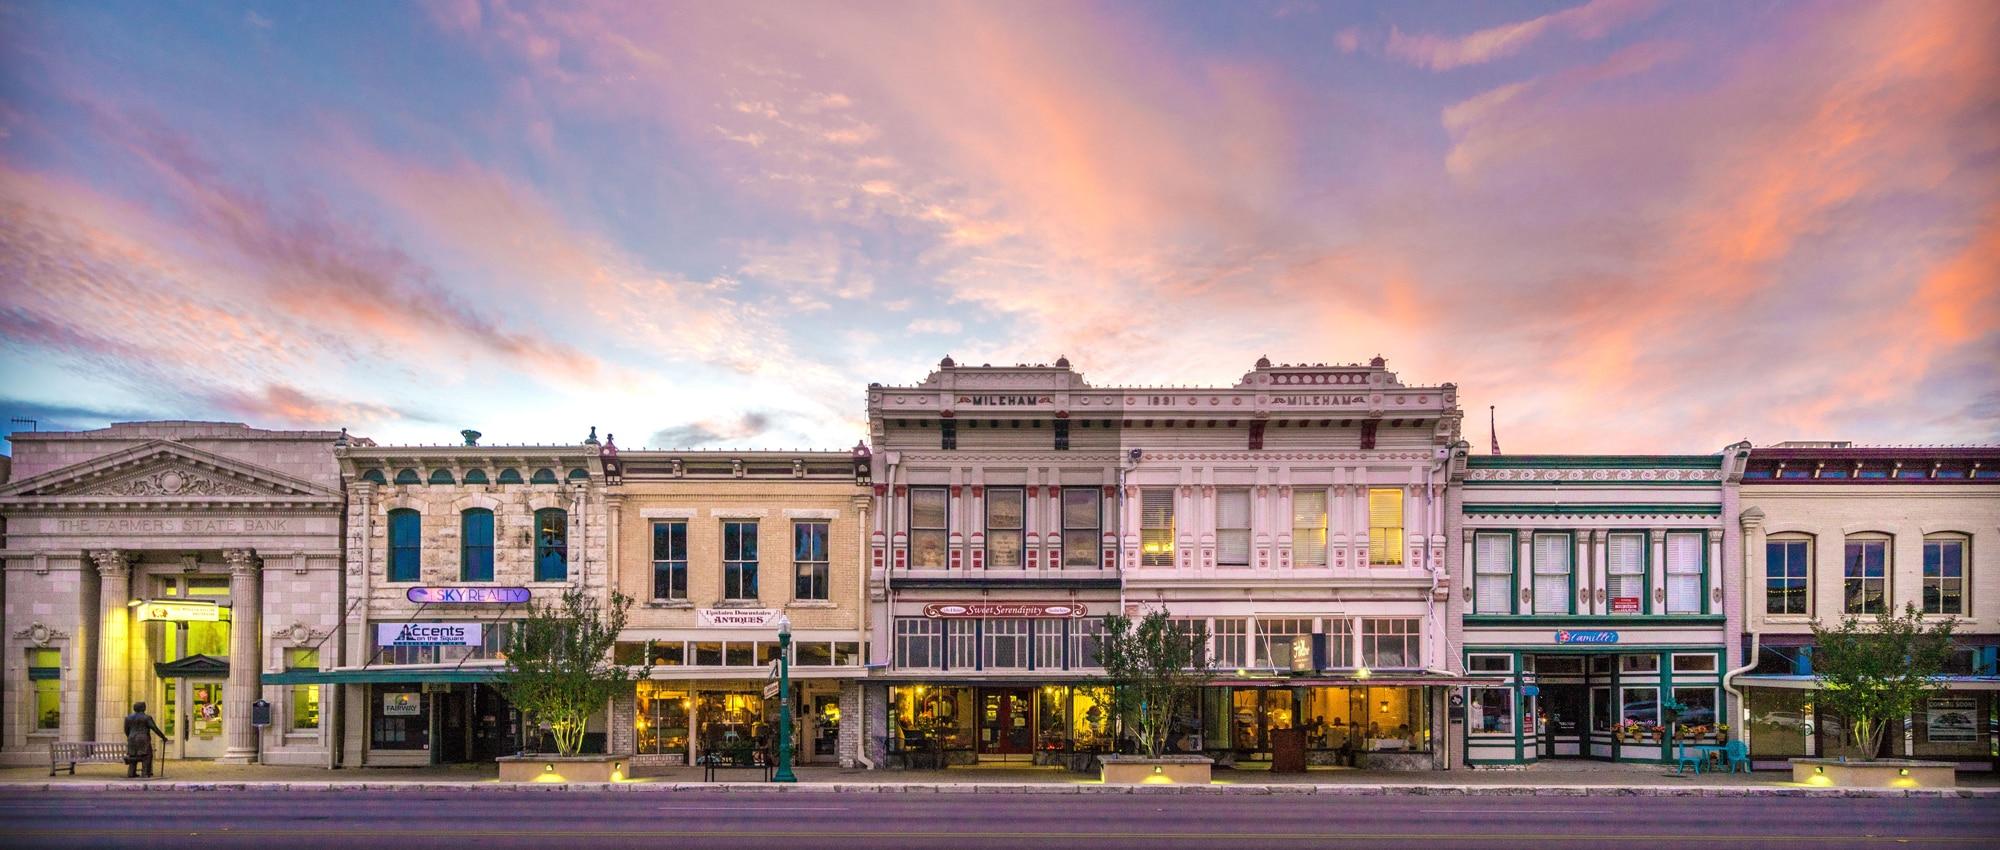 Austin-Avenue-Sunset-Georgetown-Texas